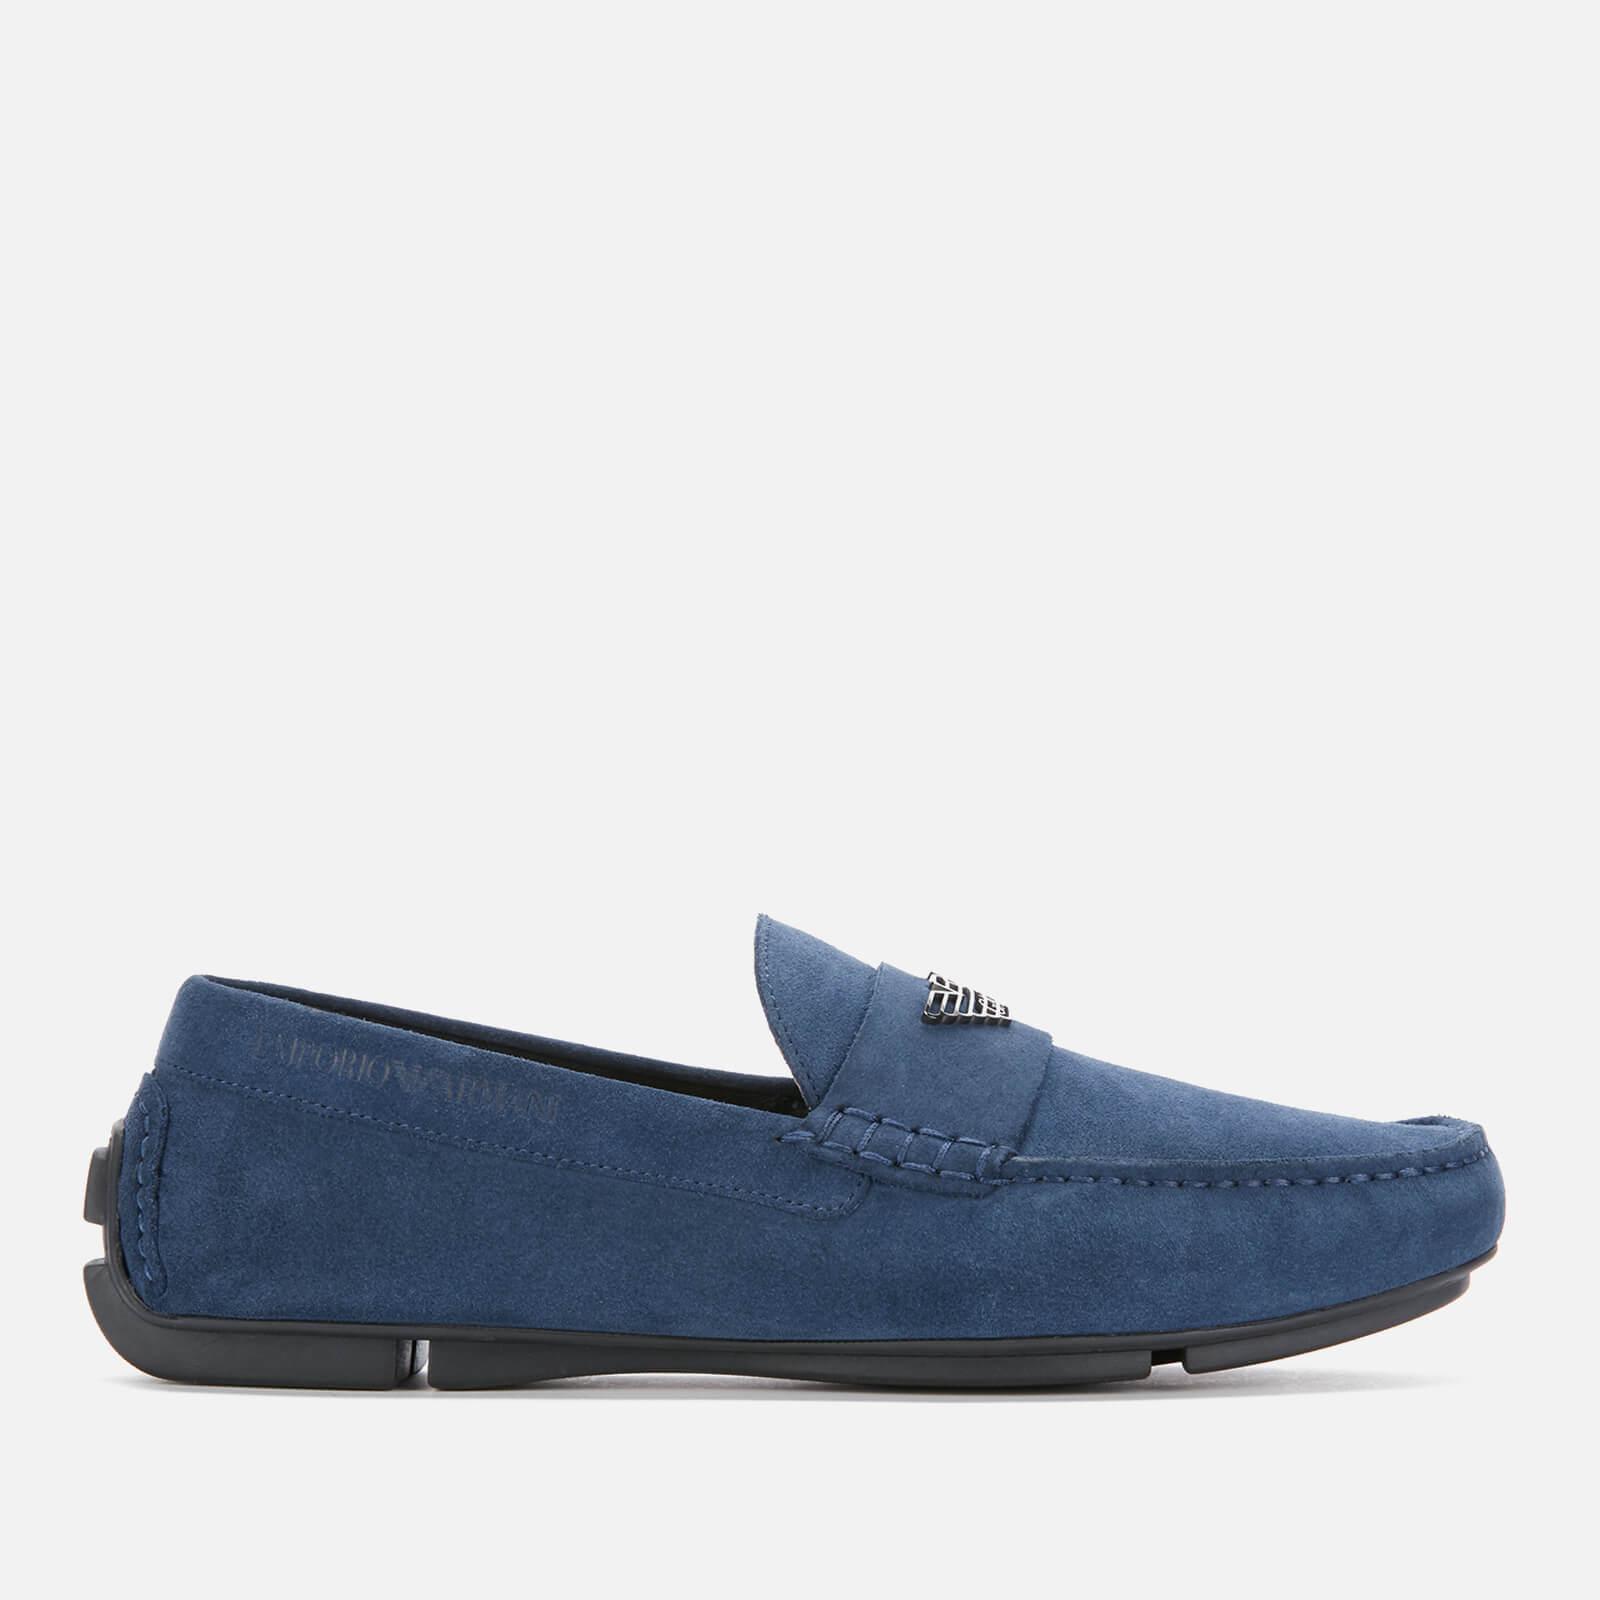 Emporio Armani s Suede Driving Shoes - Midnight - EU 42/UK 8 - Blue